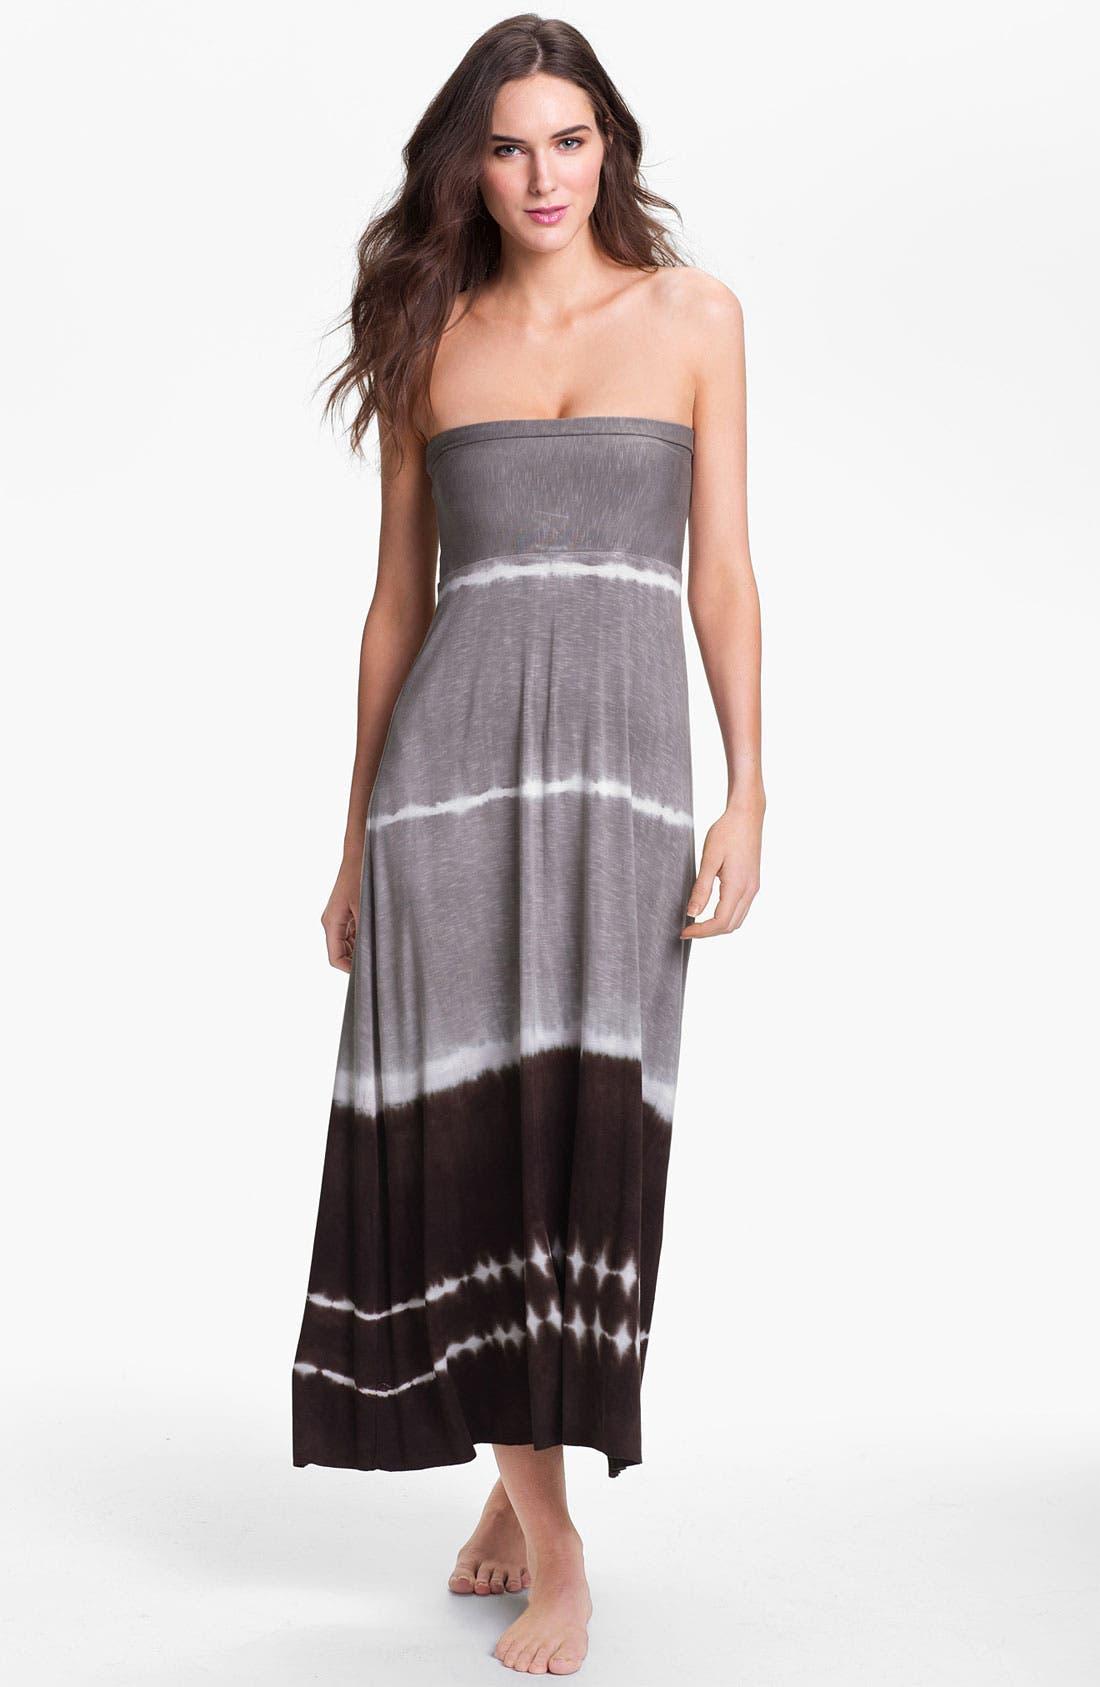 Main Image - Lucky Brand Swimwear 'Summer Lovin' Convertible Cover-Up Dress